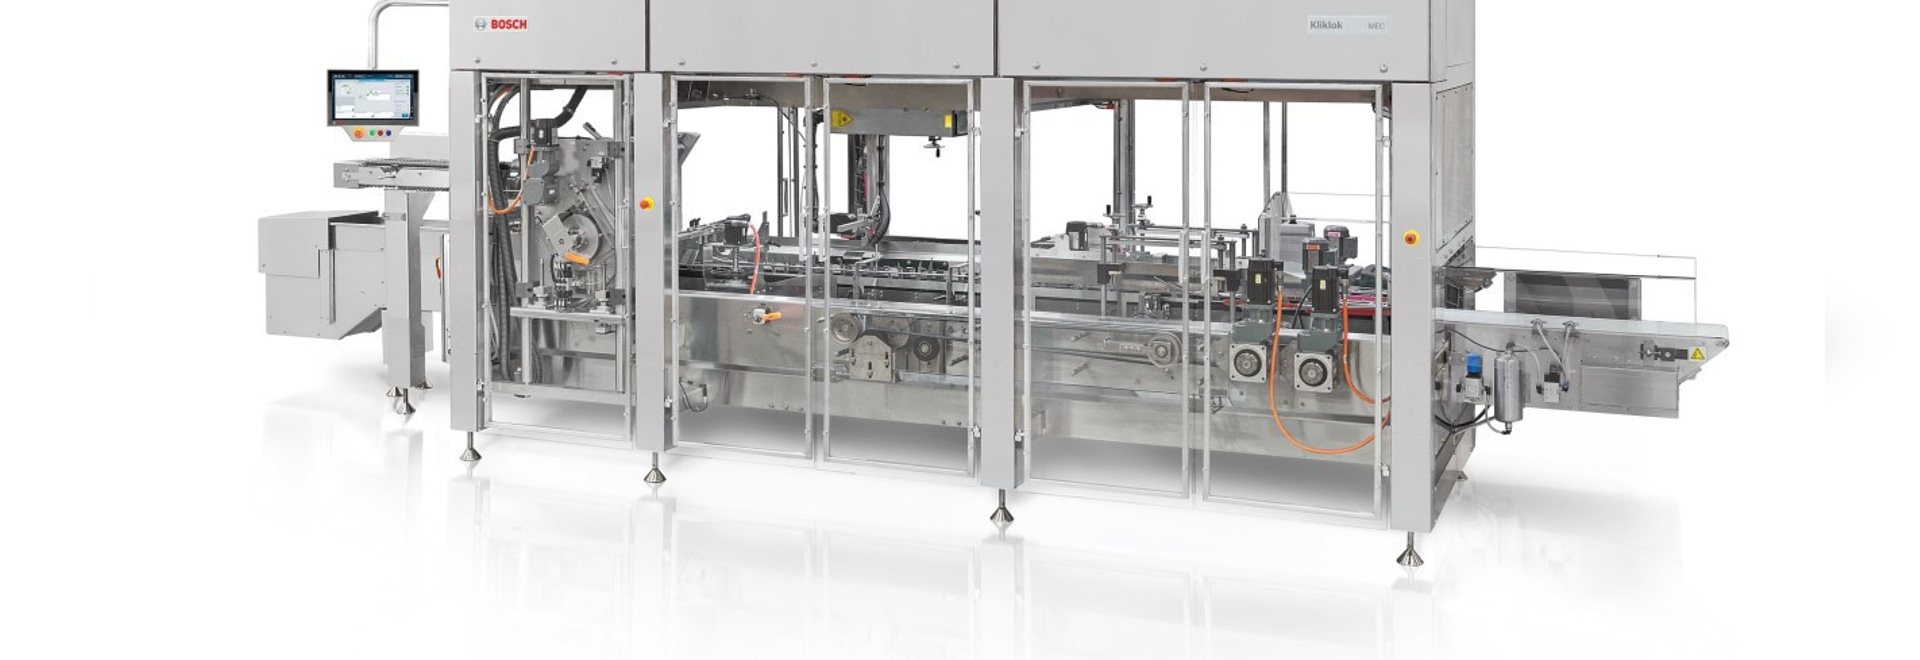 Bosch Packaging: Bag-in-Box-Handhabungssystem